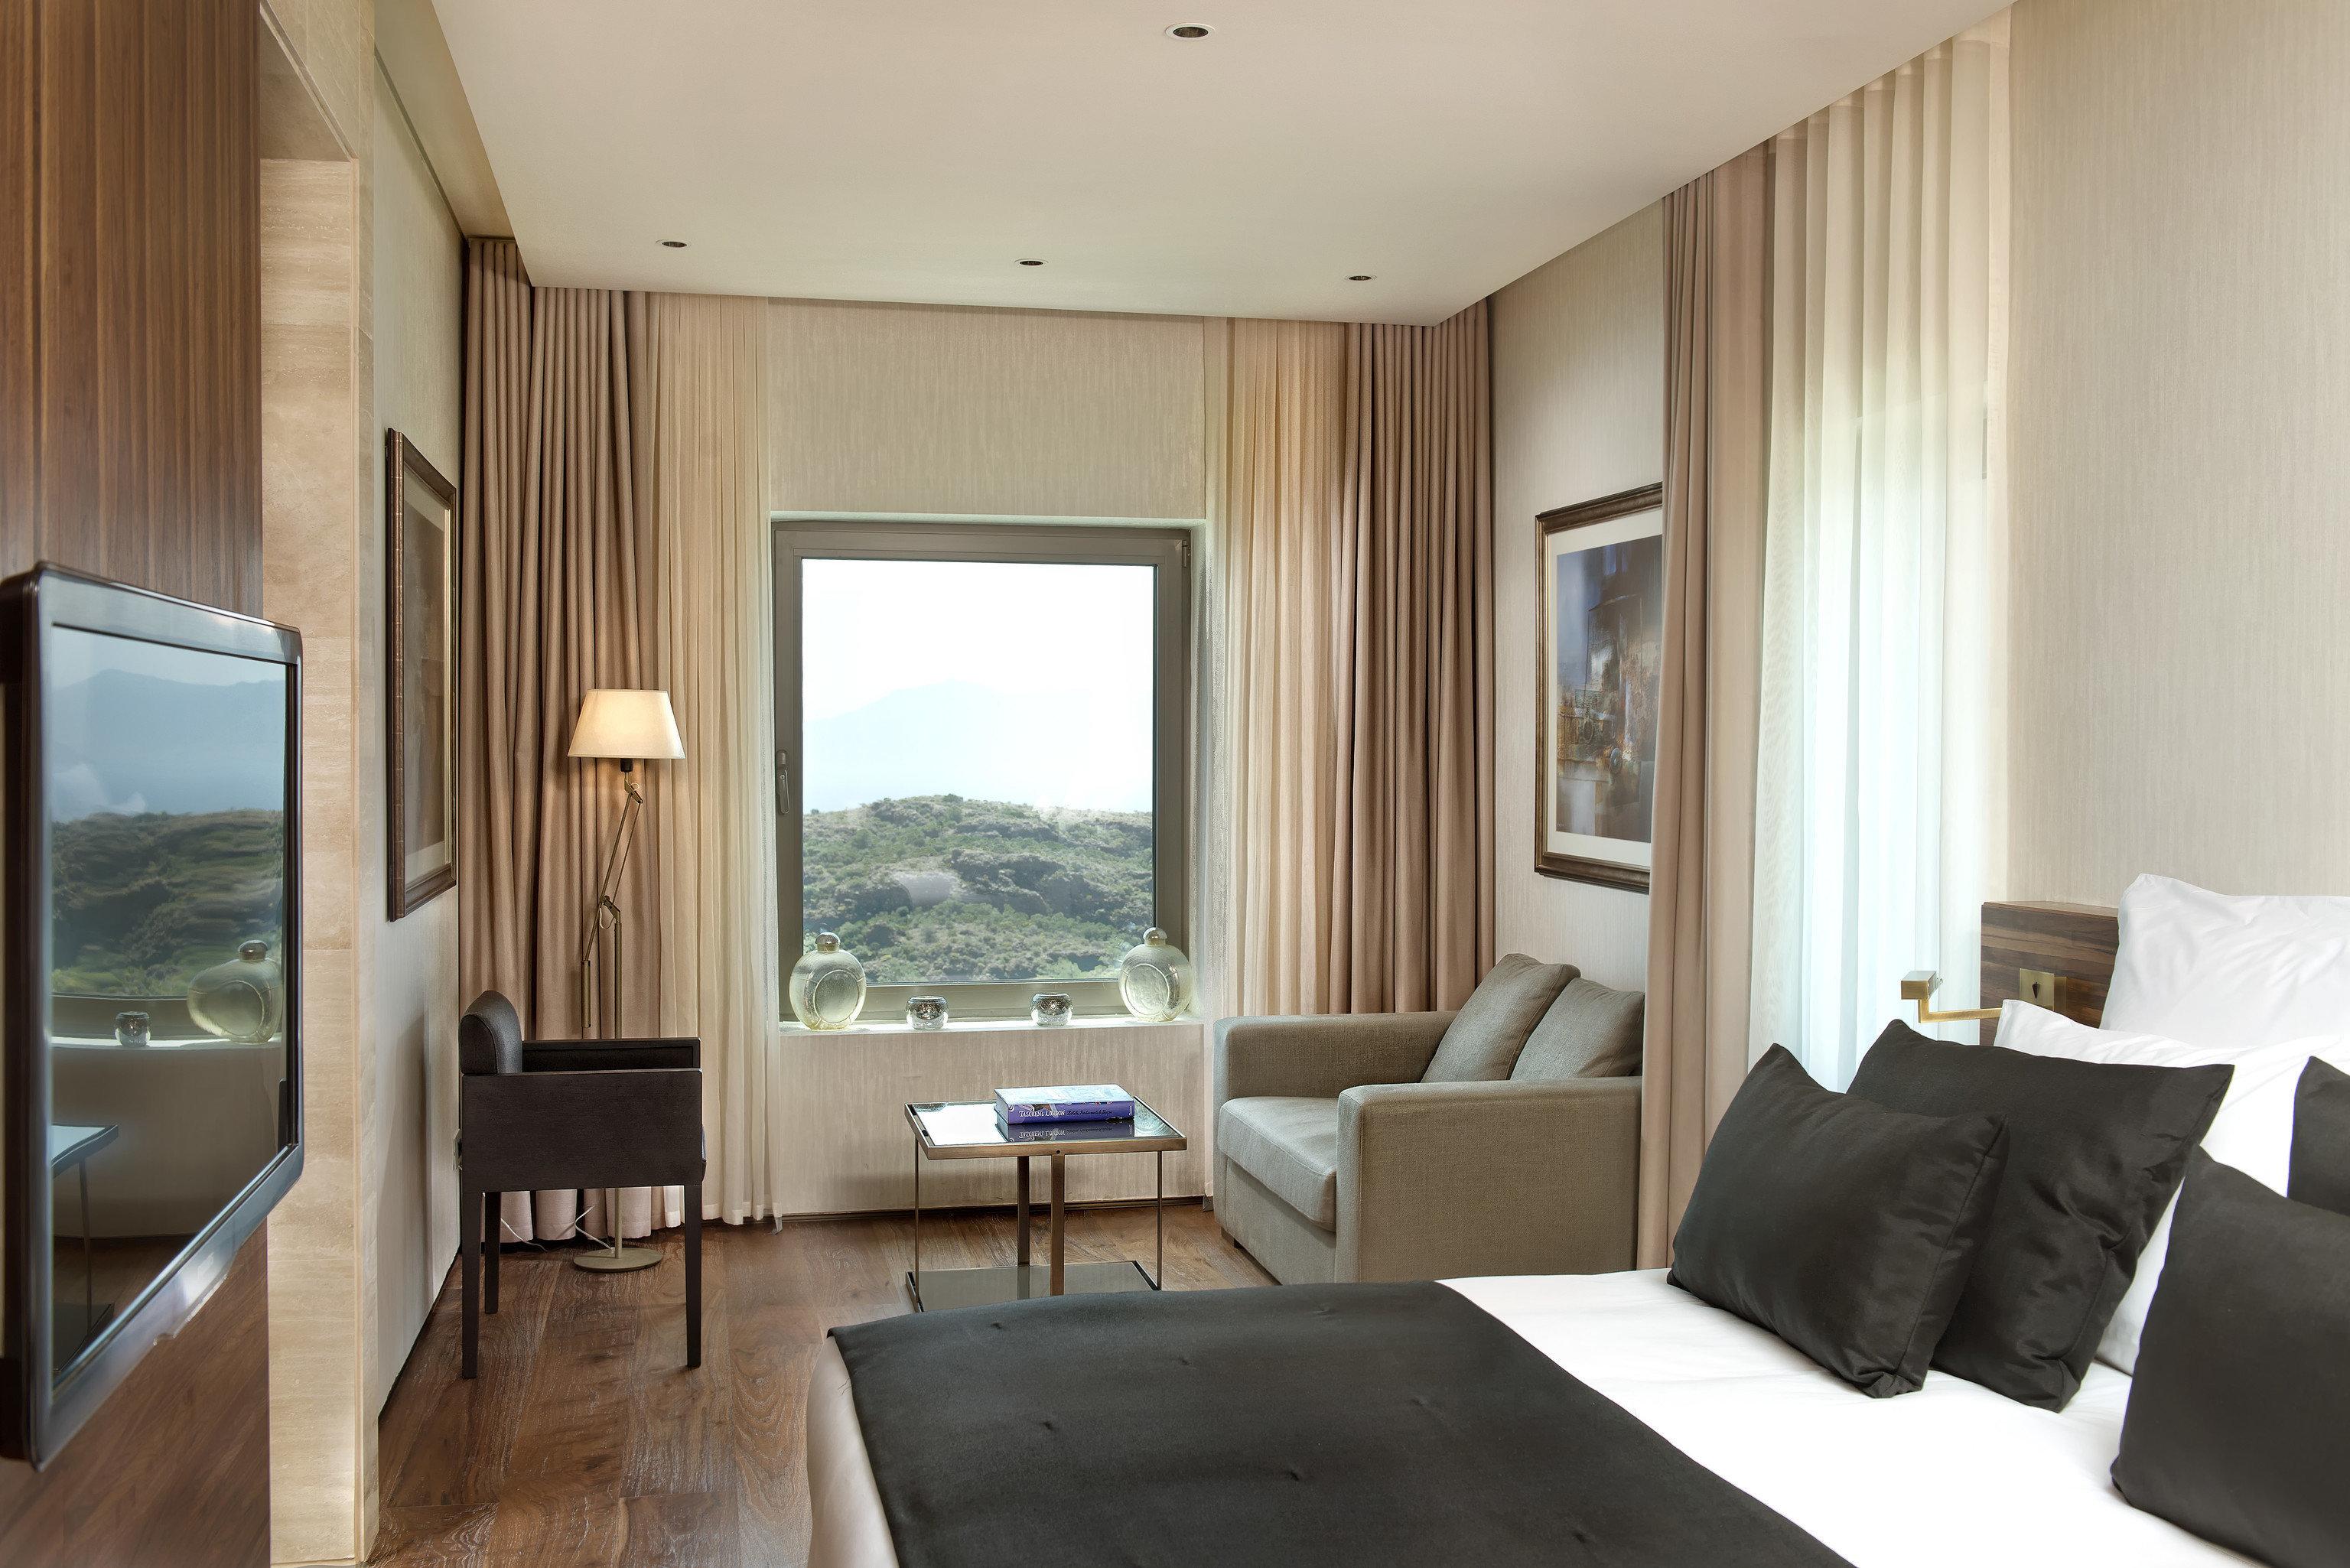 sofa property living room Suite condominium home Bedroom cottage